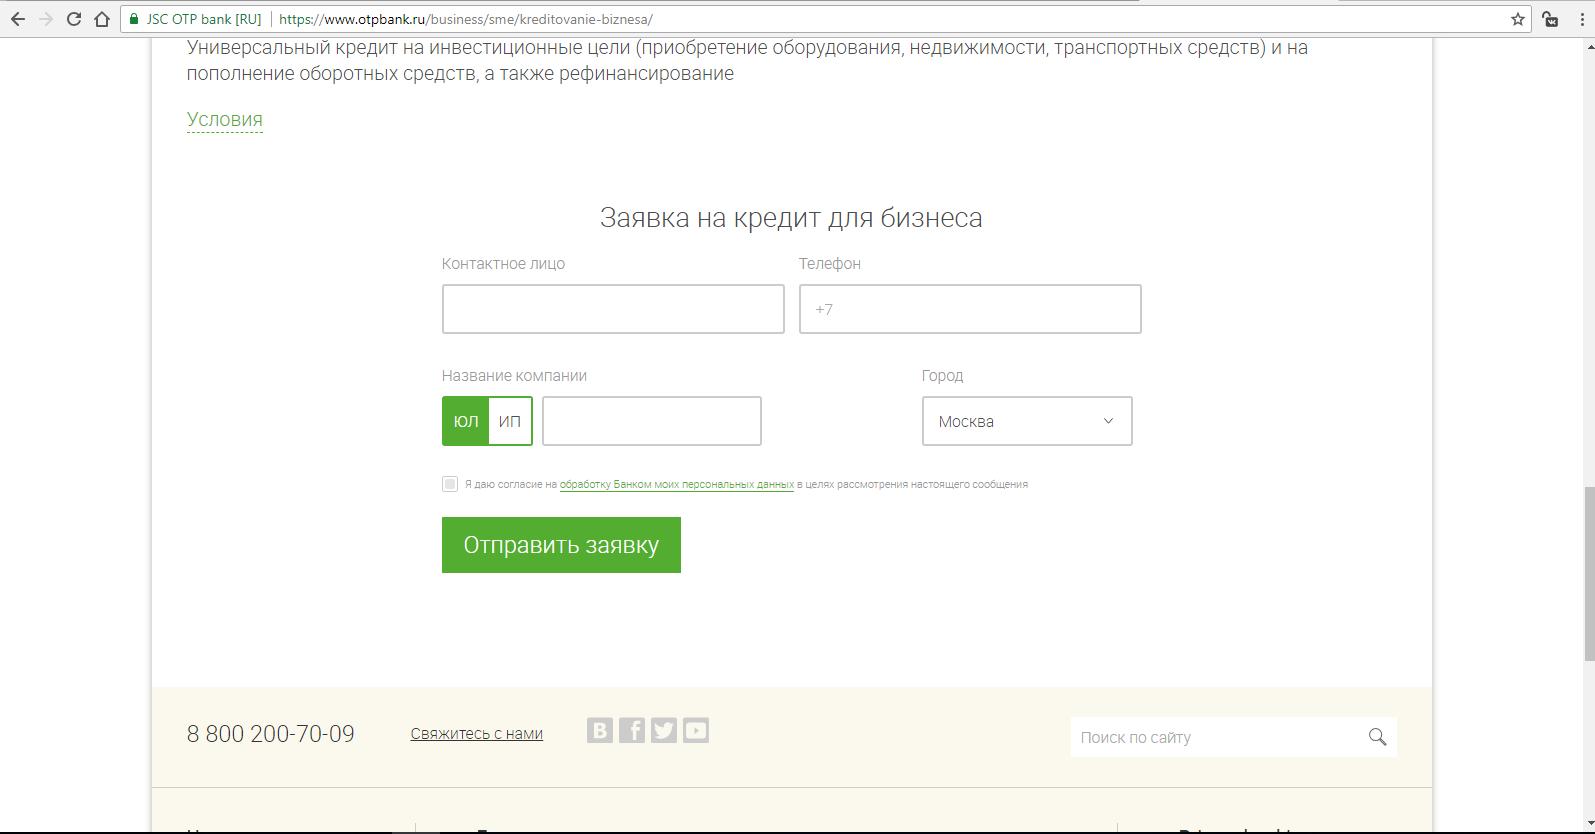 Форма заявки на овердрафт кредит